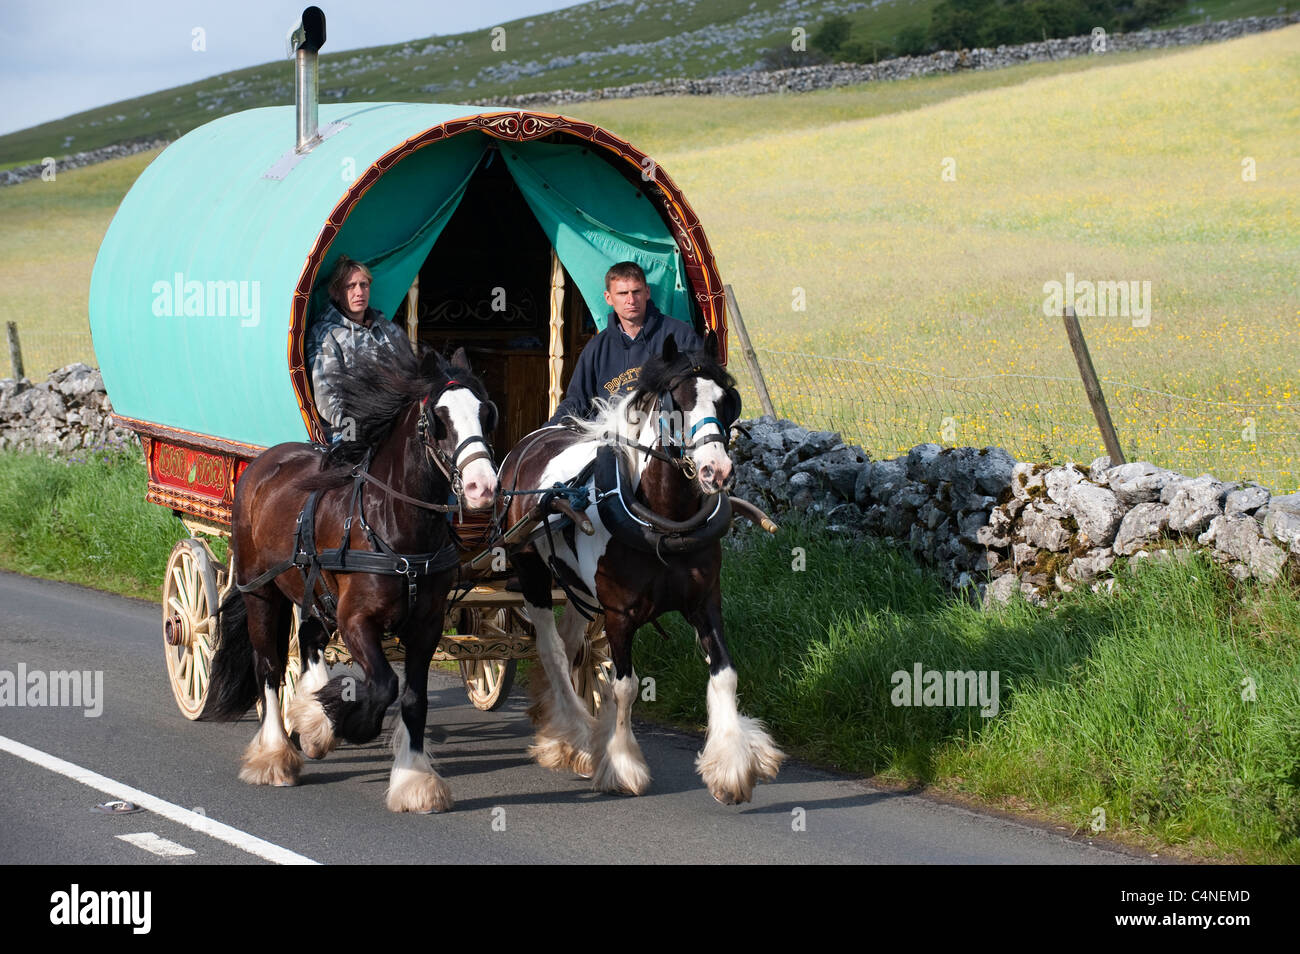 Horse drawn Gyrpsy caravan on main road near Sedbergh at time of Appleby Fair. - Stock Image